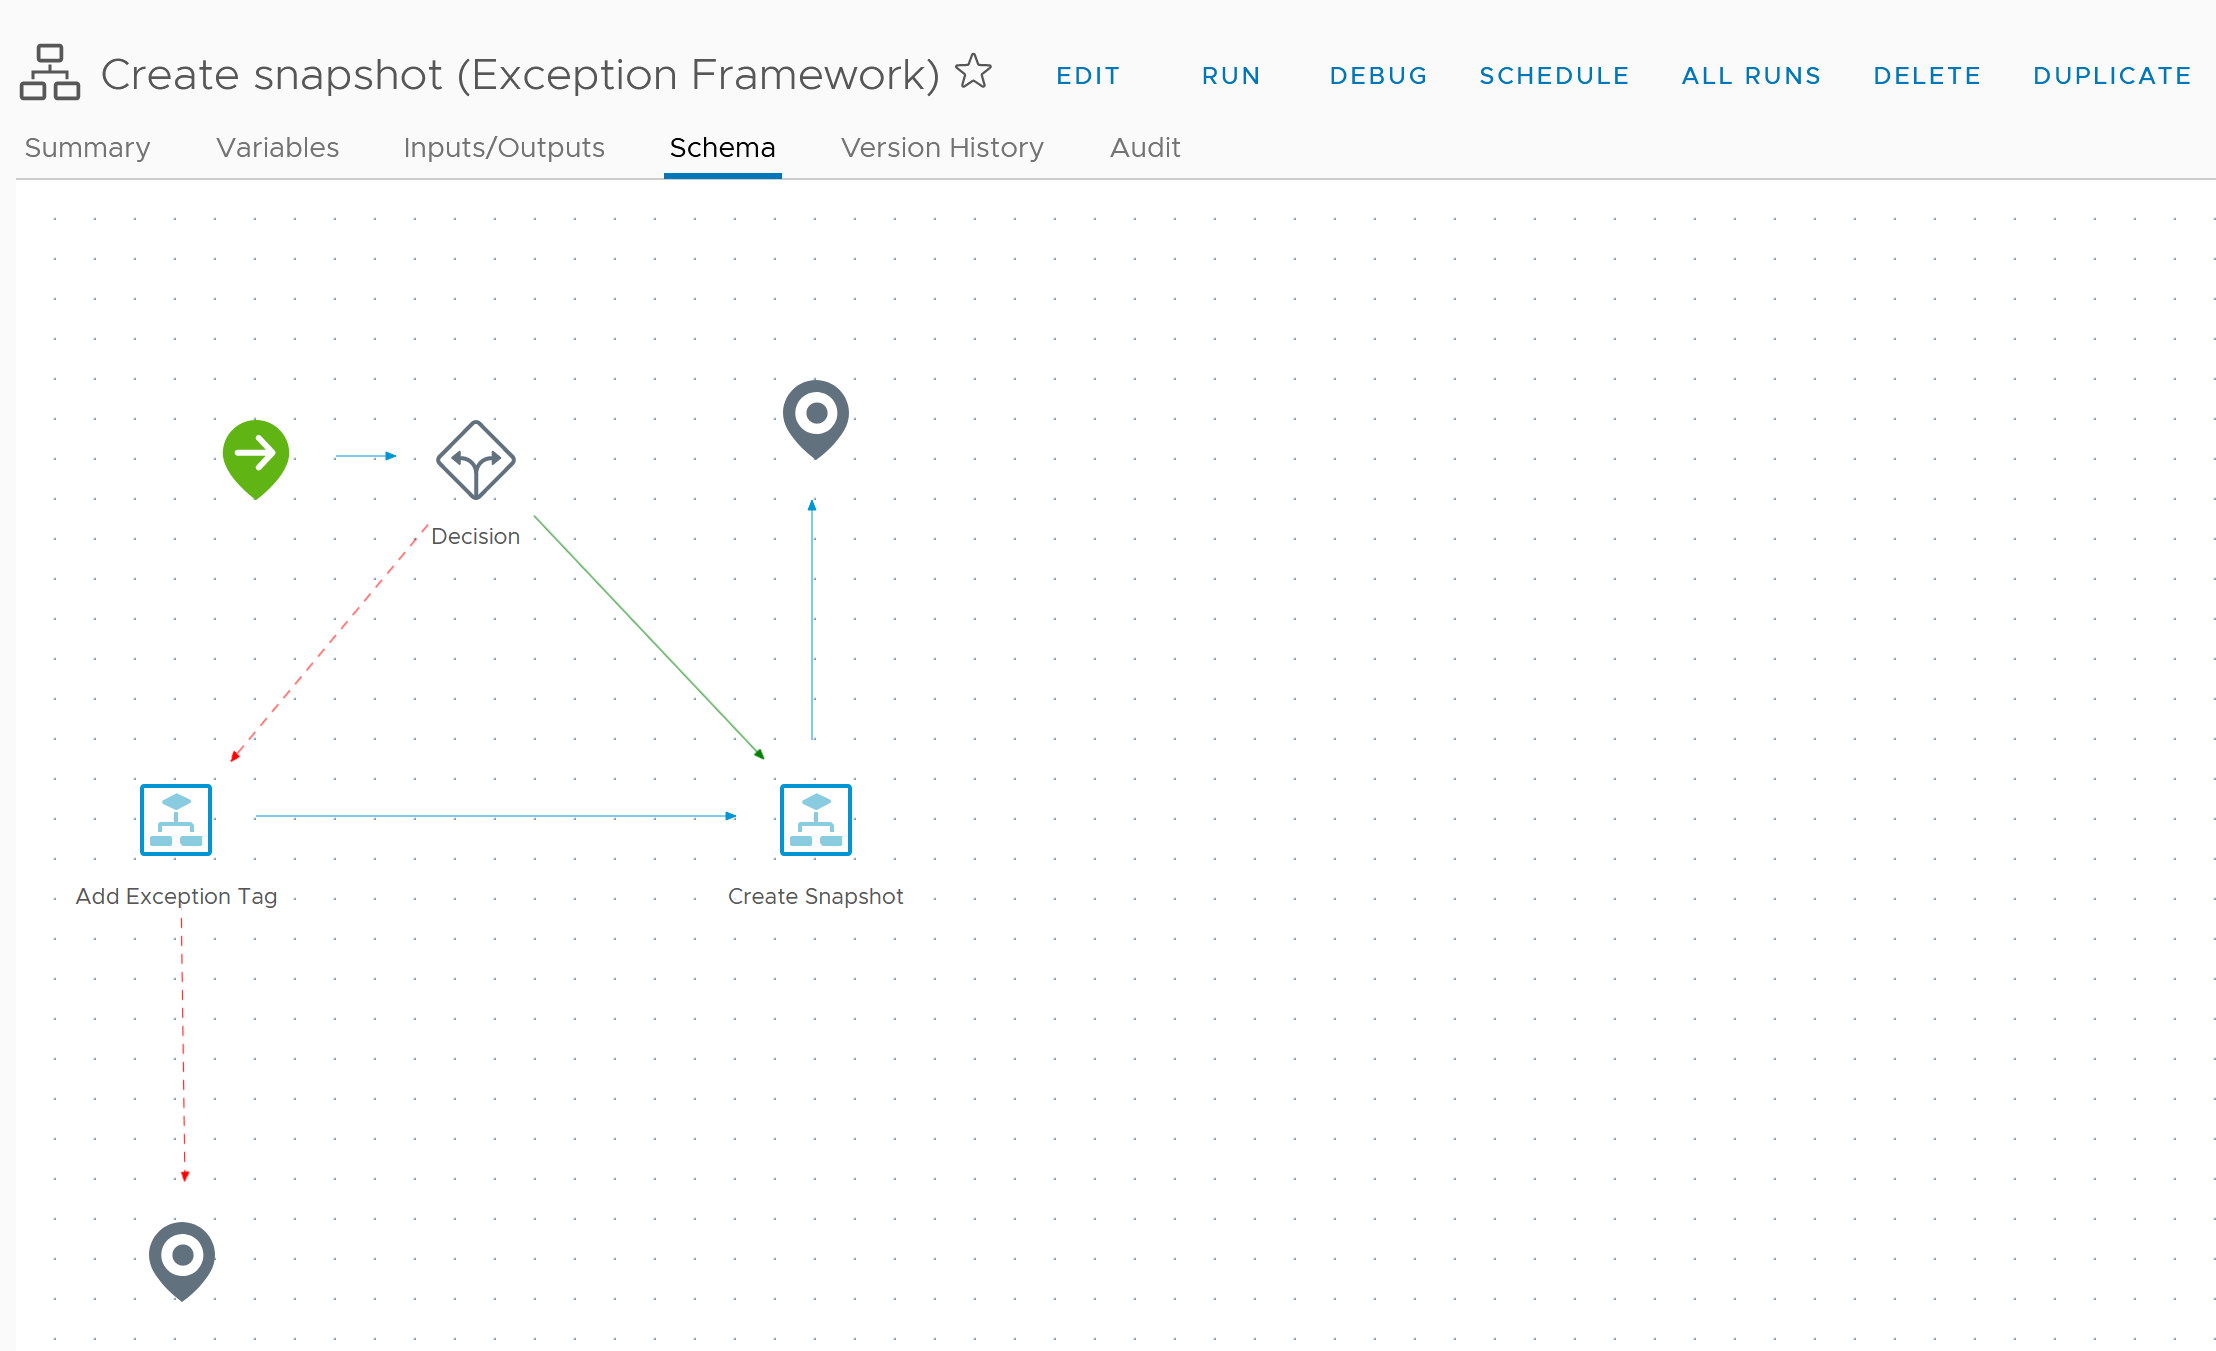 Main Workflow